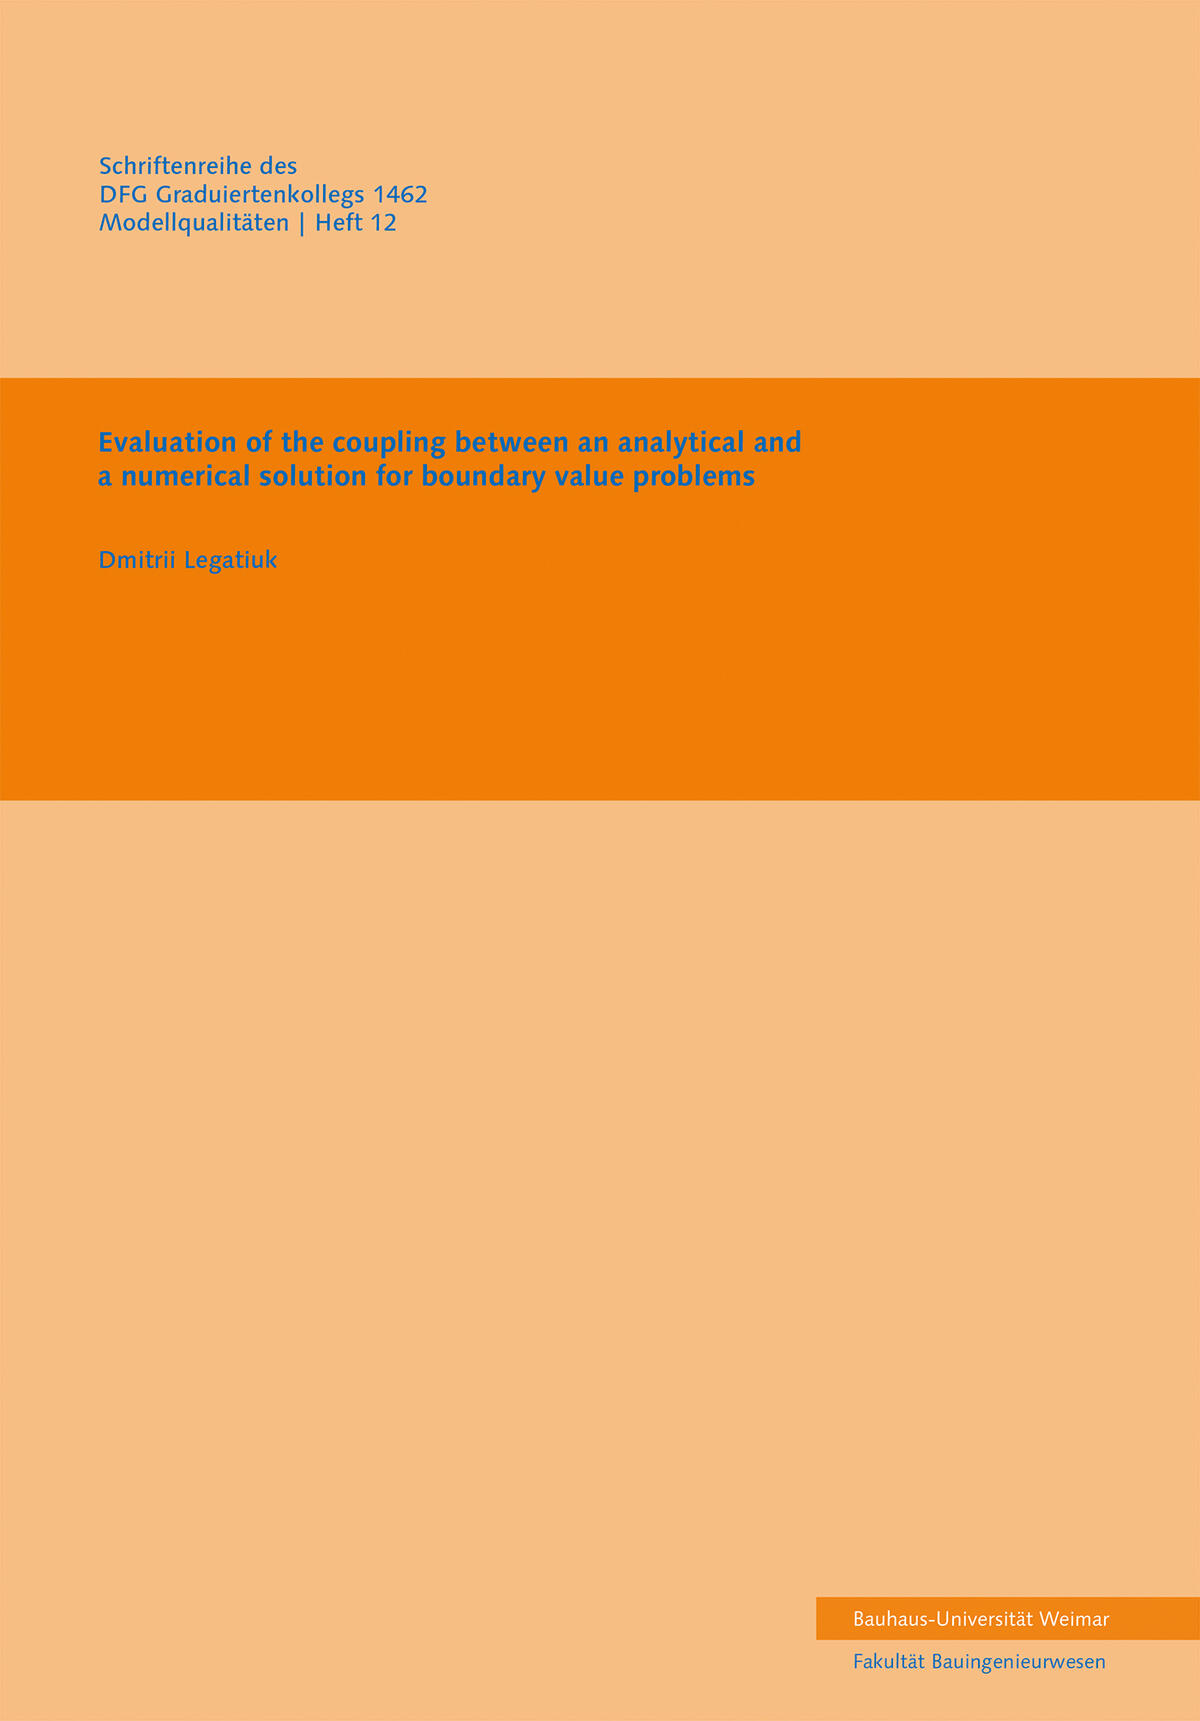 (Writings of K. Balagopal) Reservationlu: Prajaswamika Drukpatham